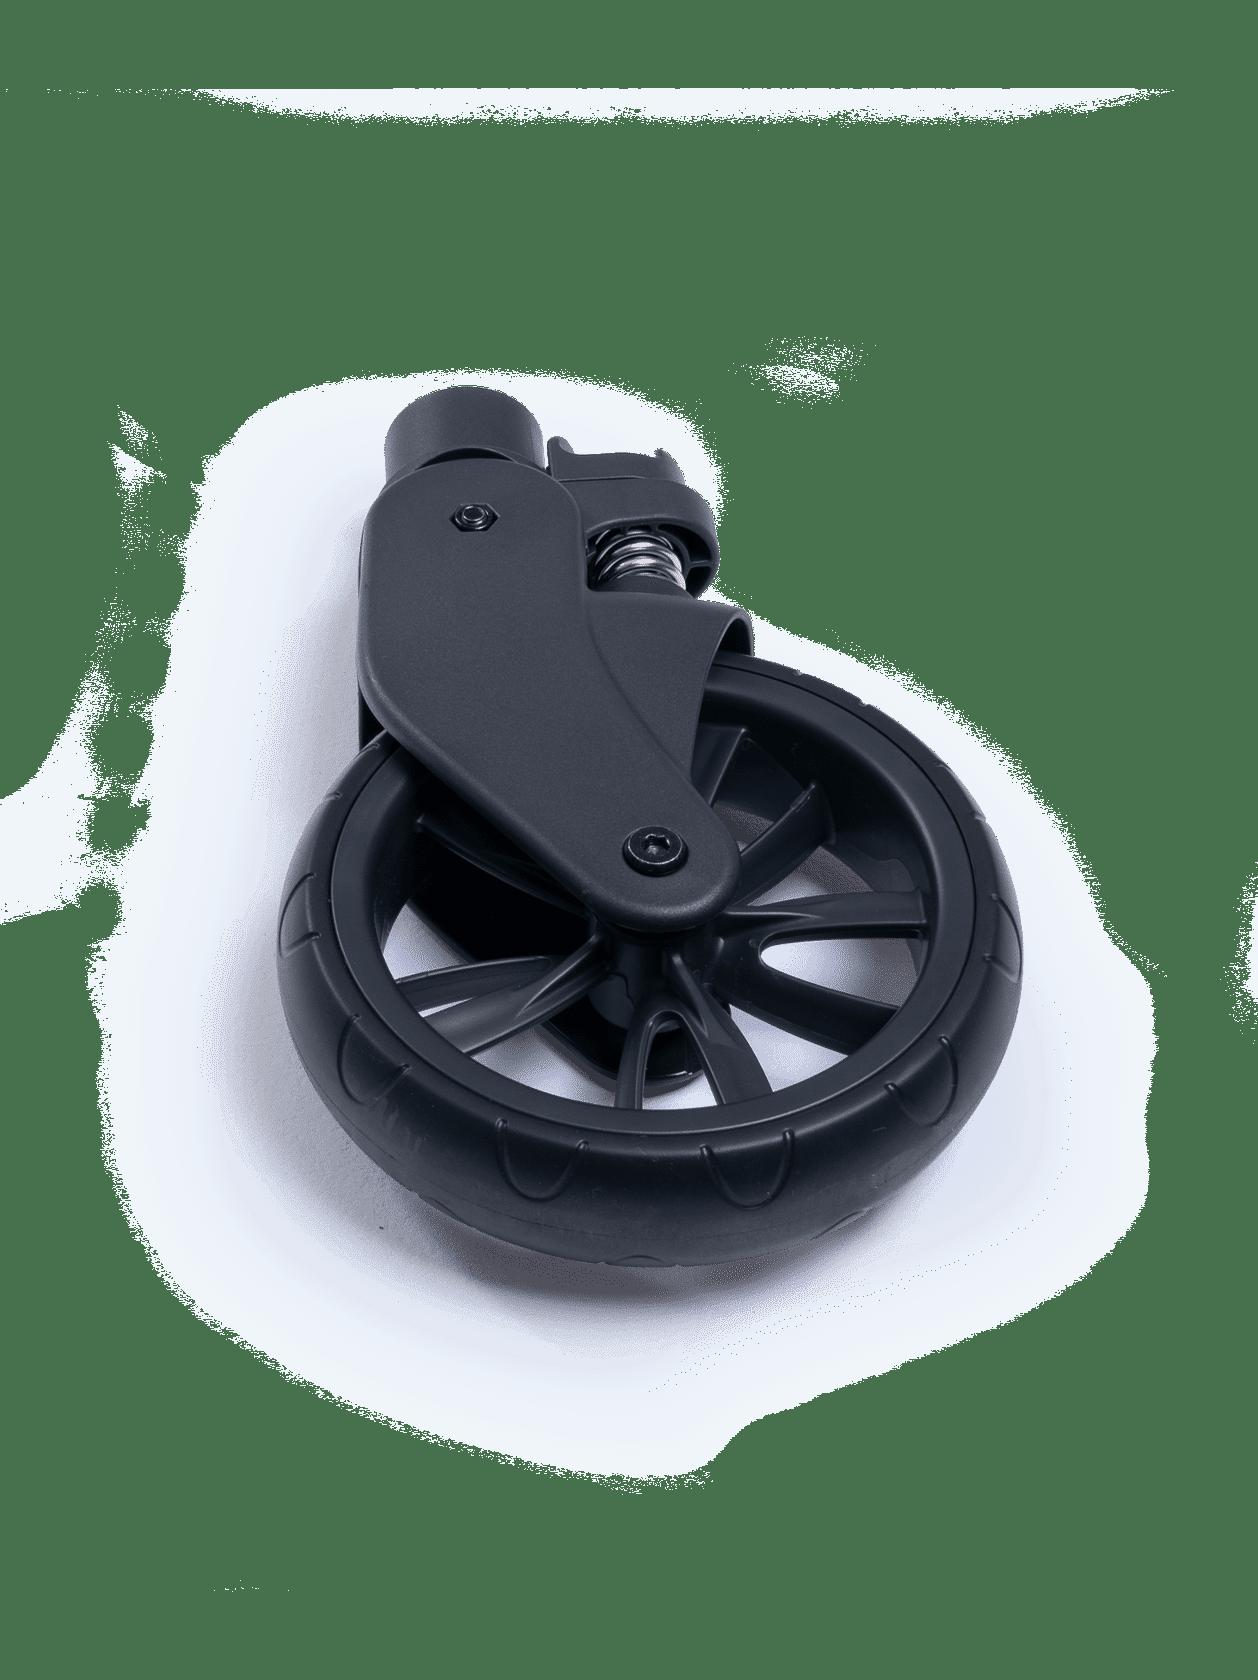 Lime 2020 Front Wheel & Fork (R)